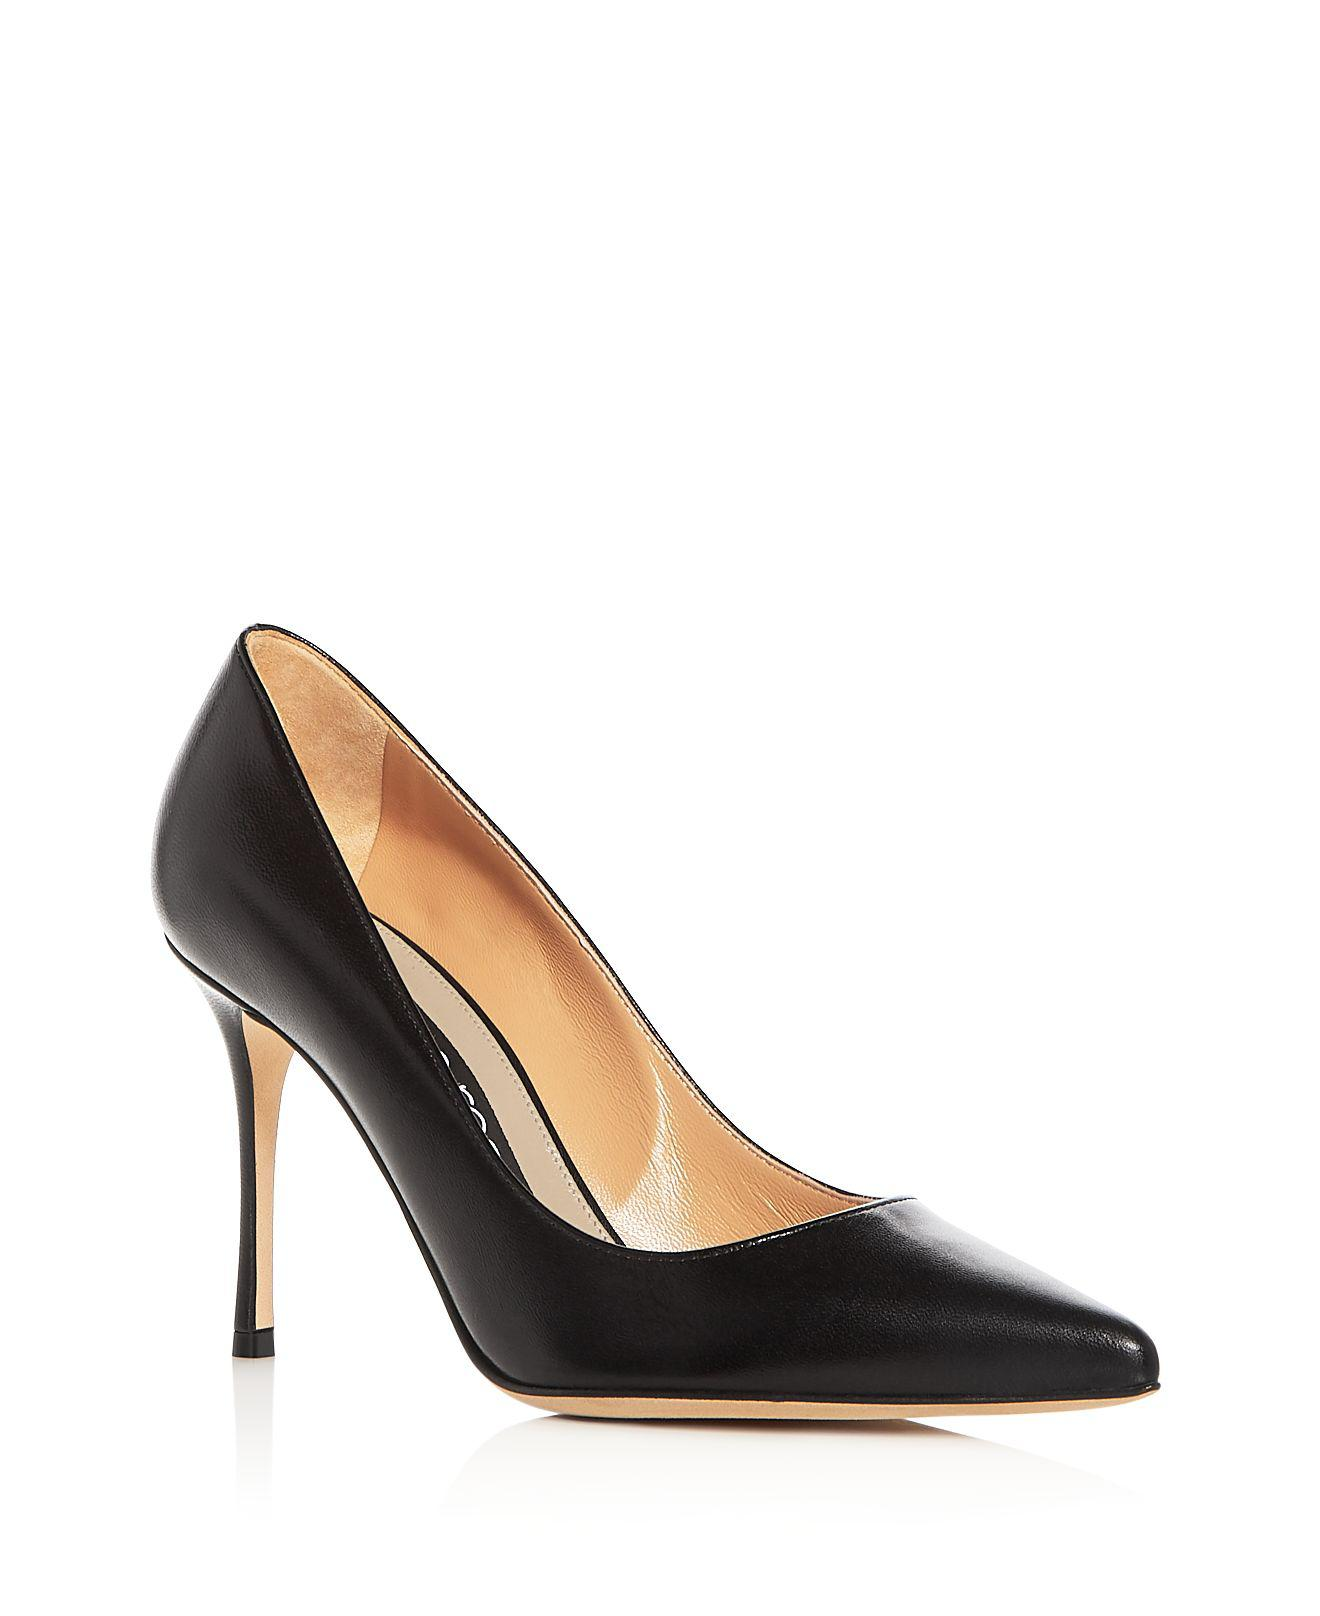 Sergio Rossi. Black Women's Godiva Leather Pointed Toe Pumps